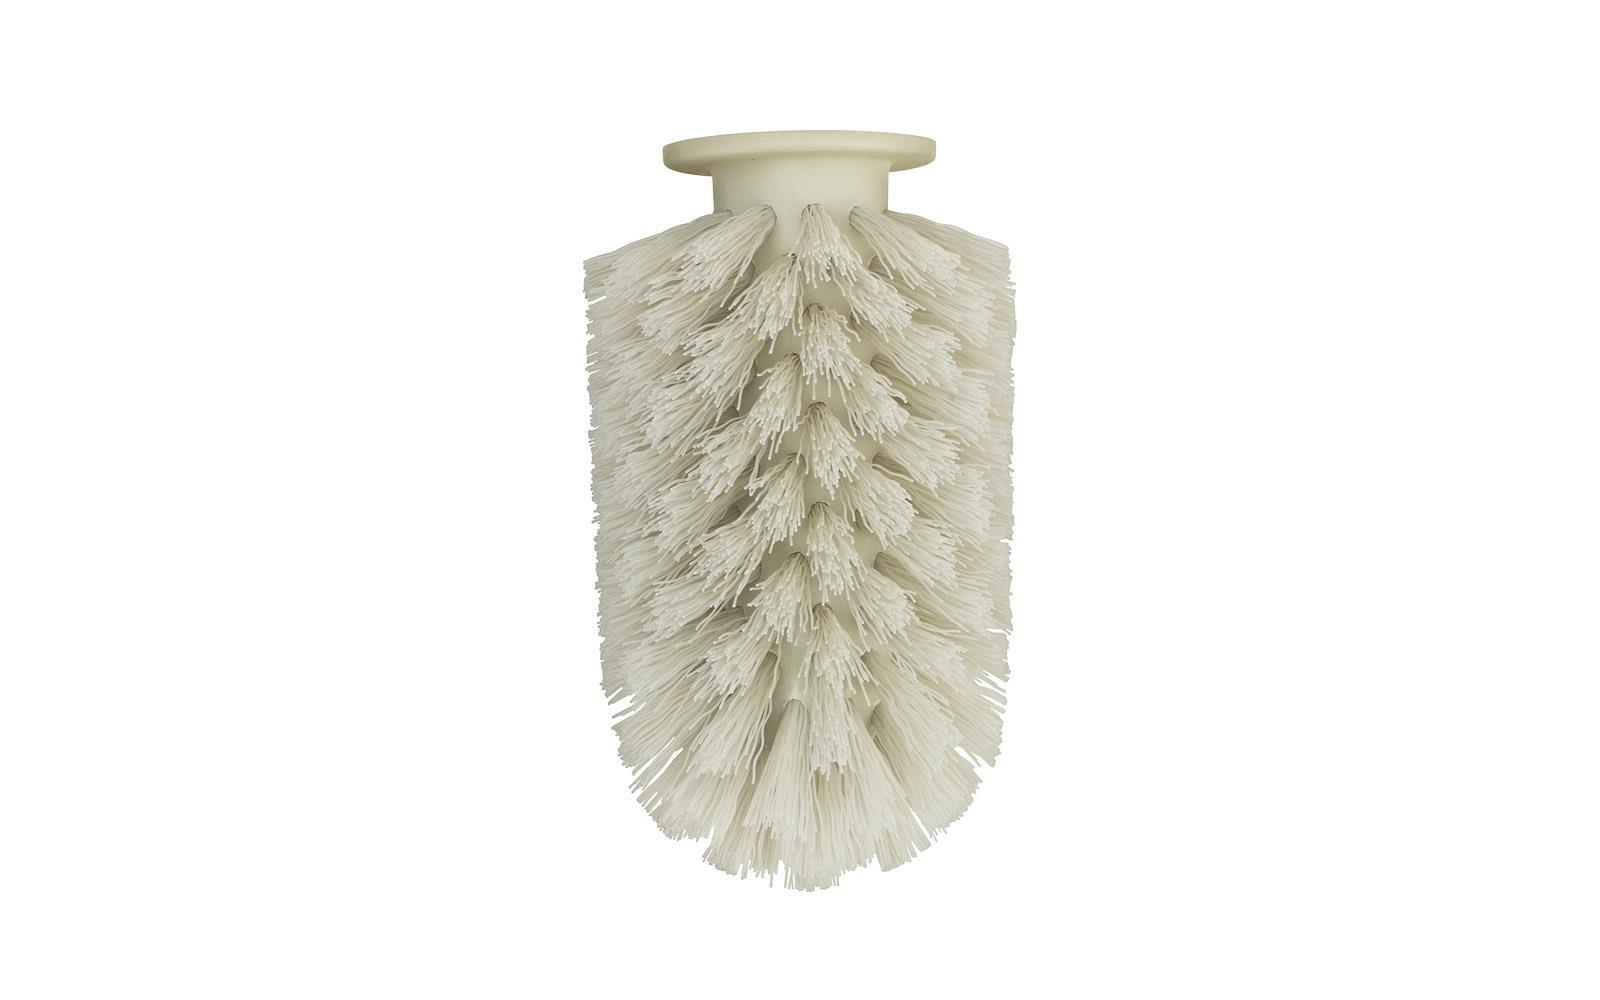 Toilet Brush Head : Ballo brush head in grey replacement head for ballo toilet brush